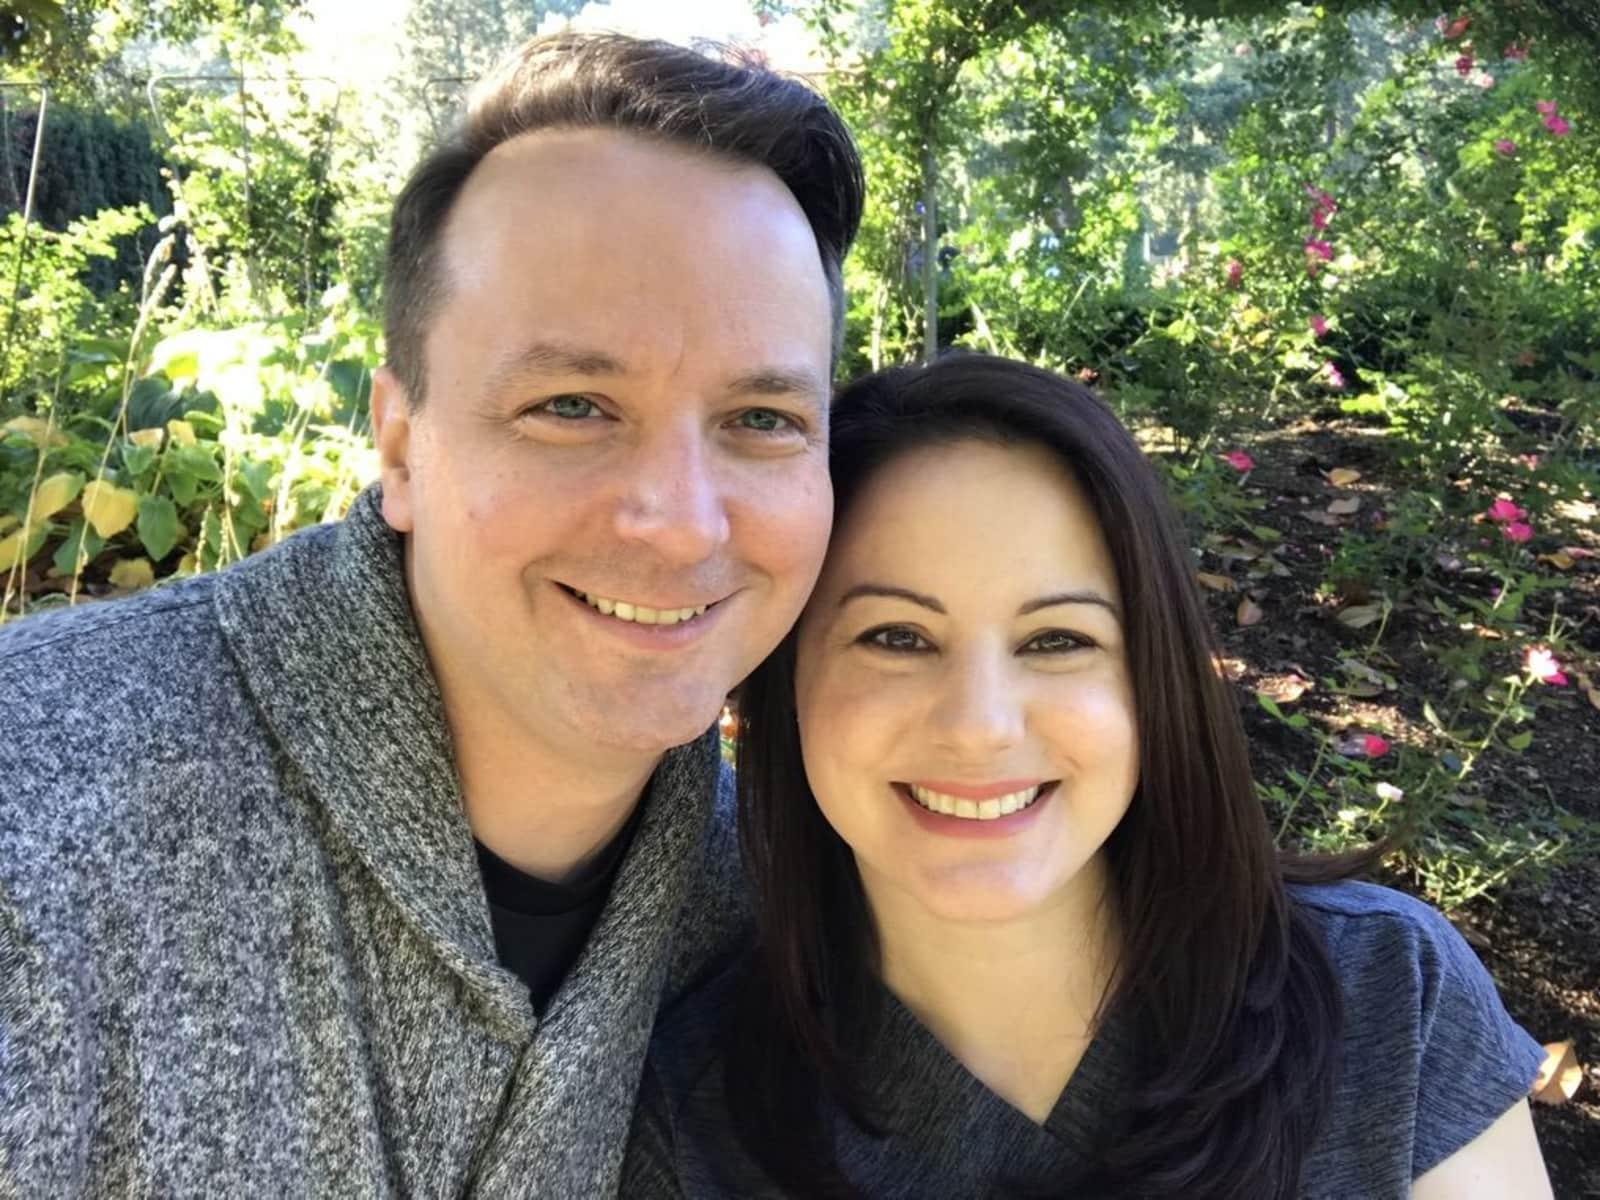 Jim & Marisa from Saint Petersburg, Florida, United States